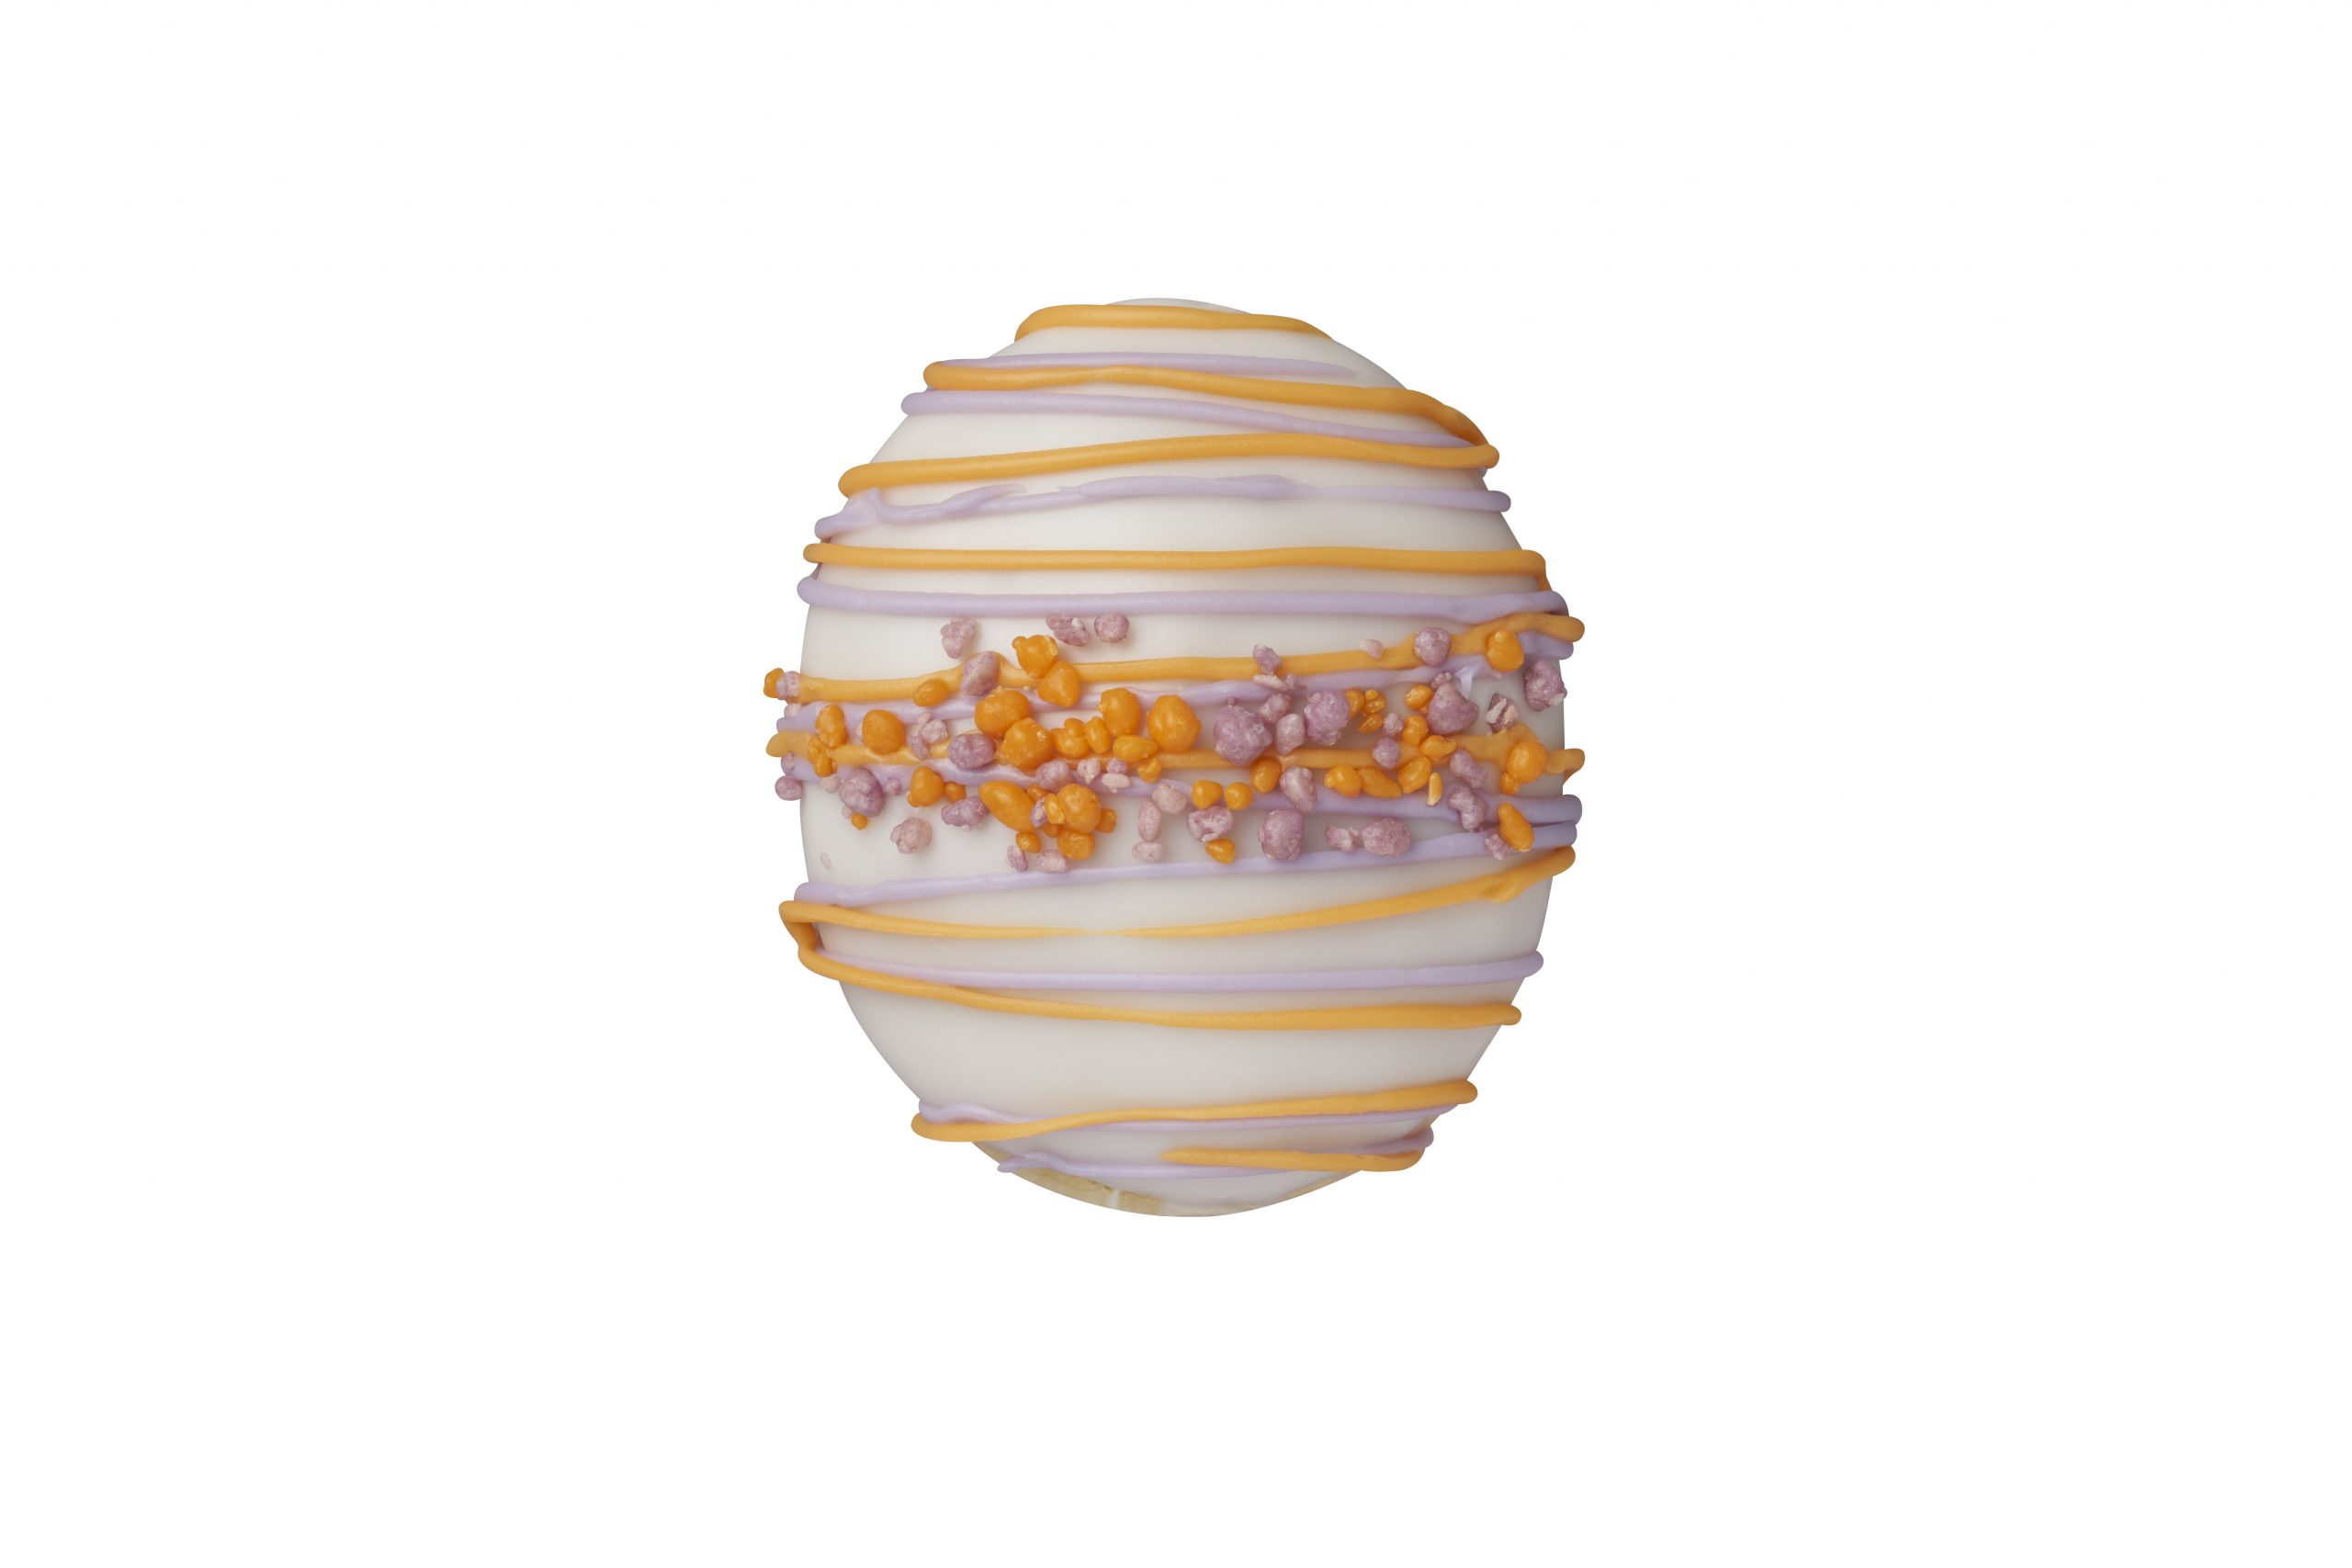 Egg-streme Berry Pop